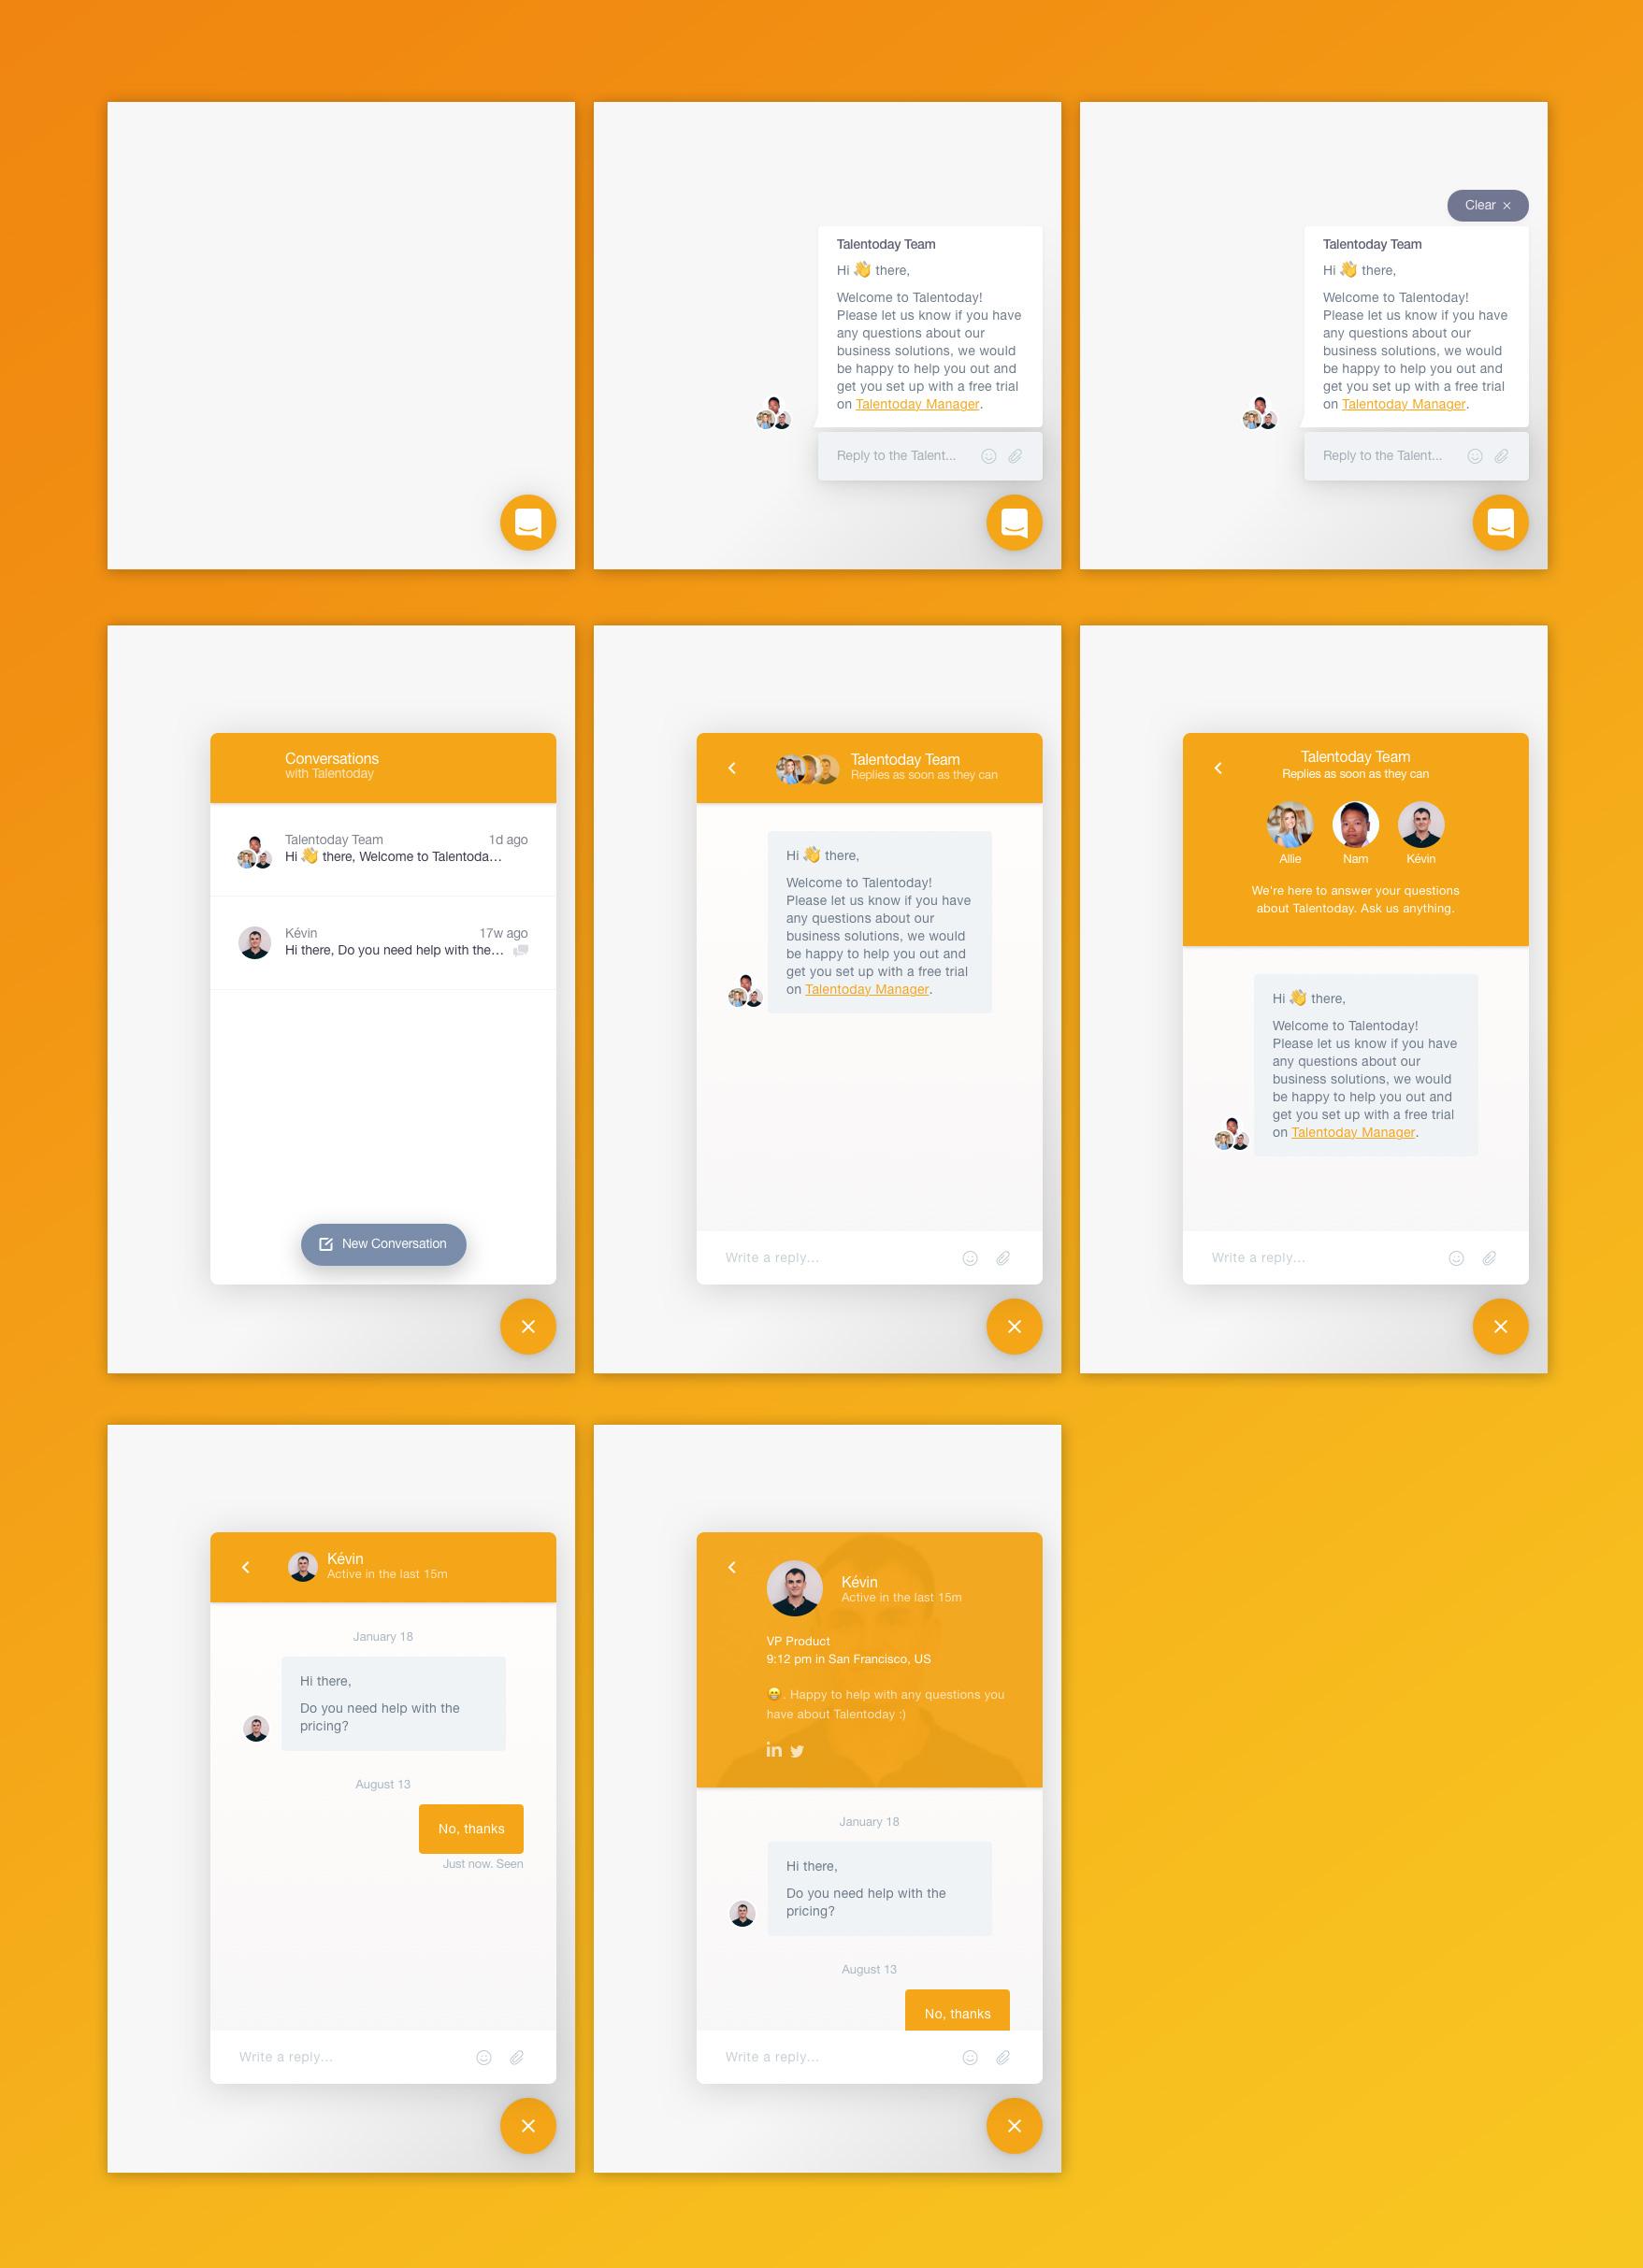 intercom-messenger-ui-sketch-resource